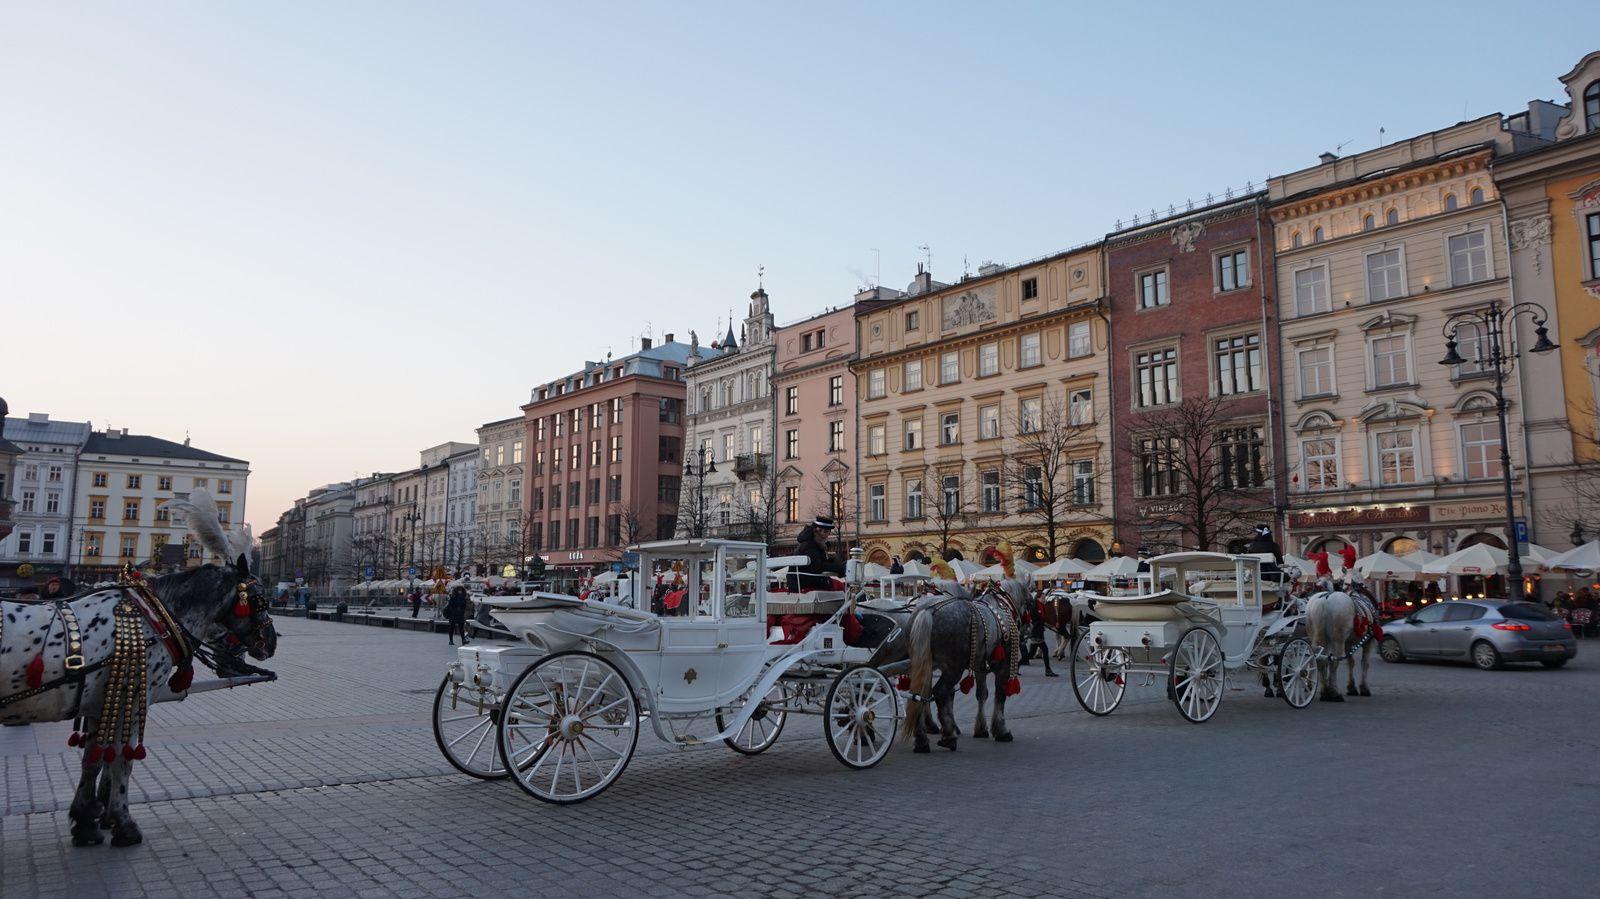 Pologne - Cracovie Marie